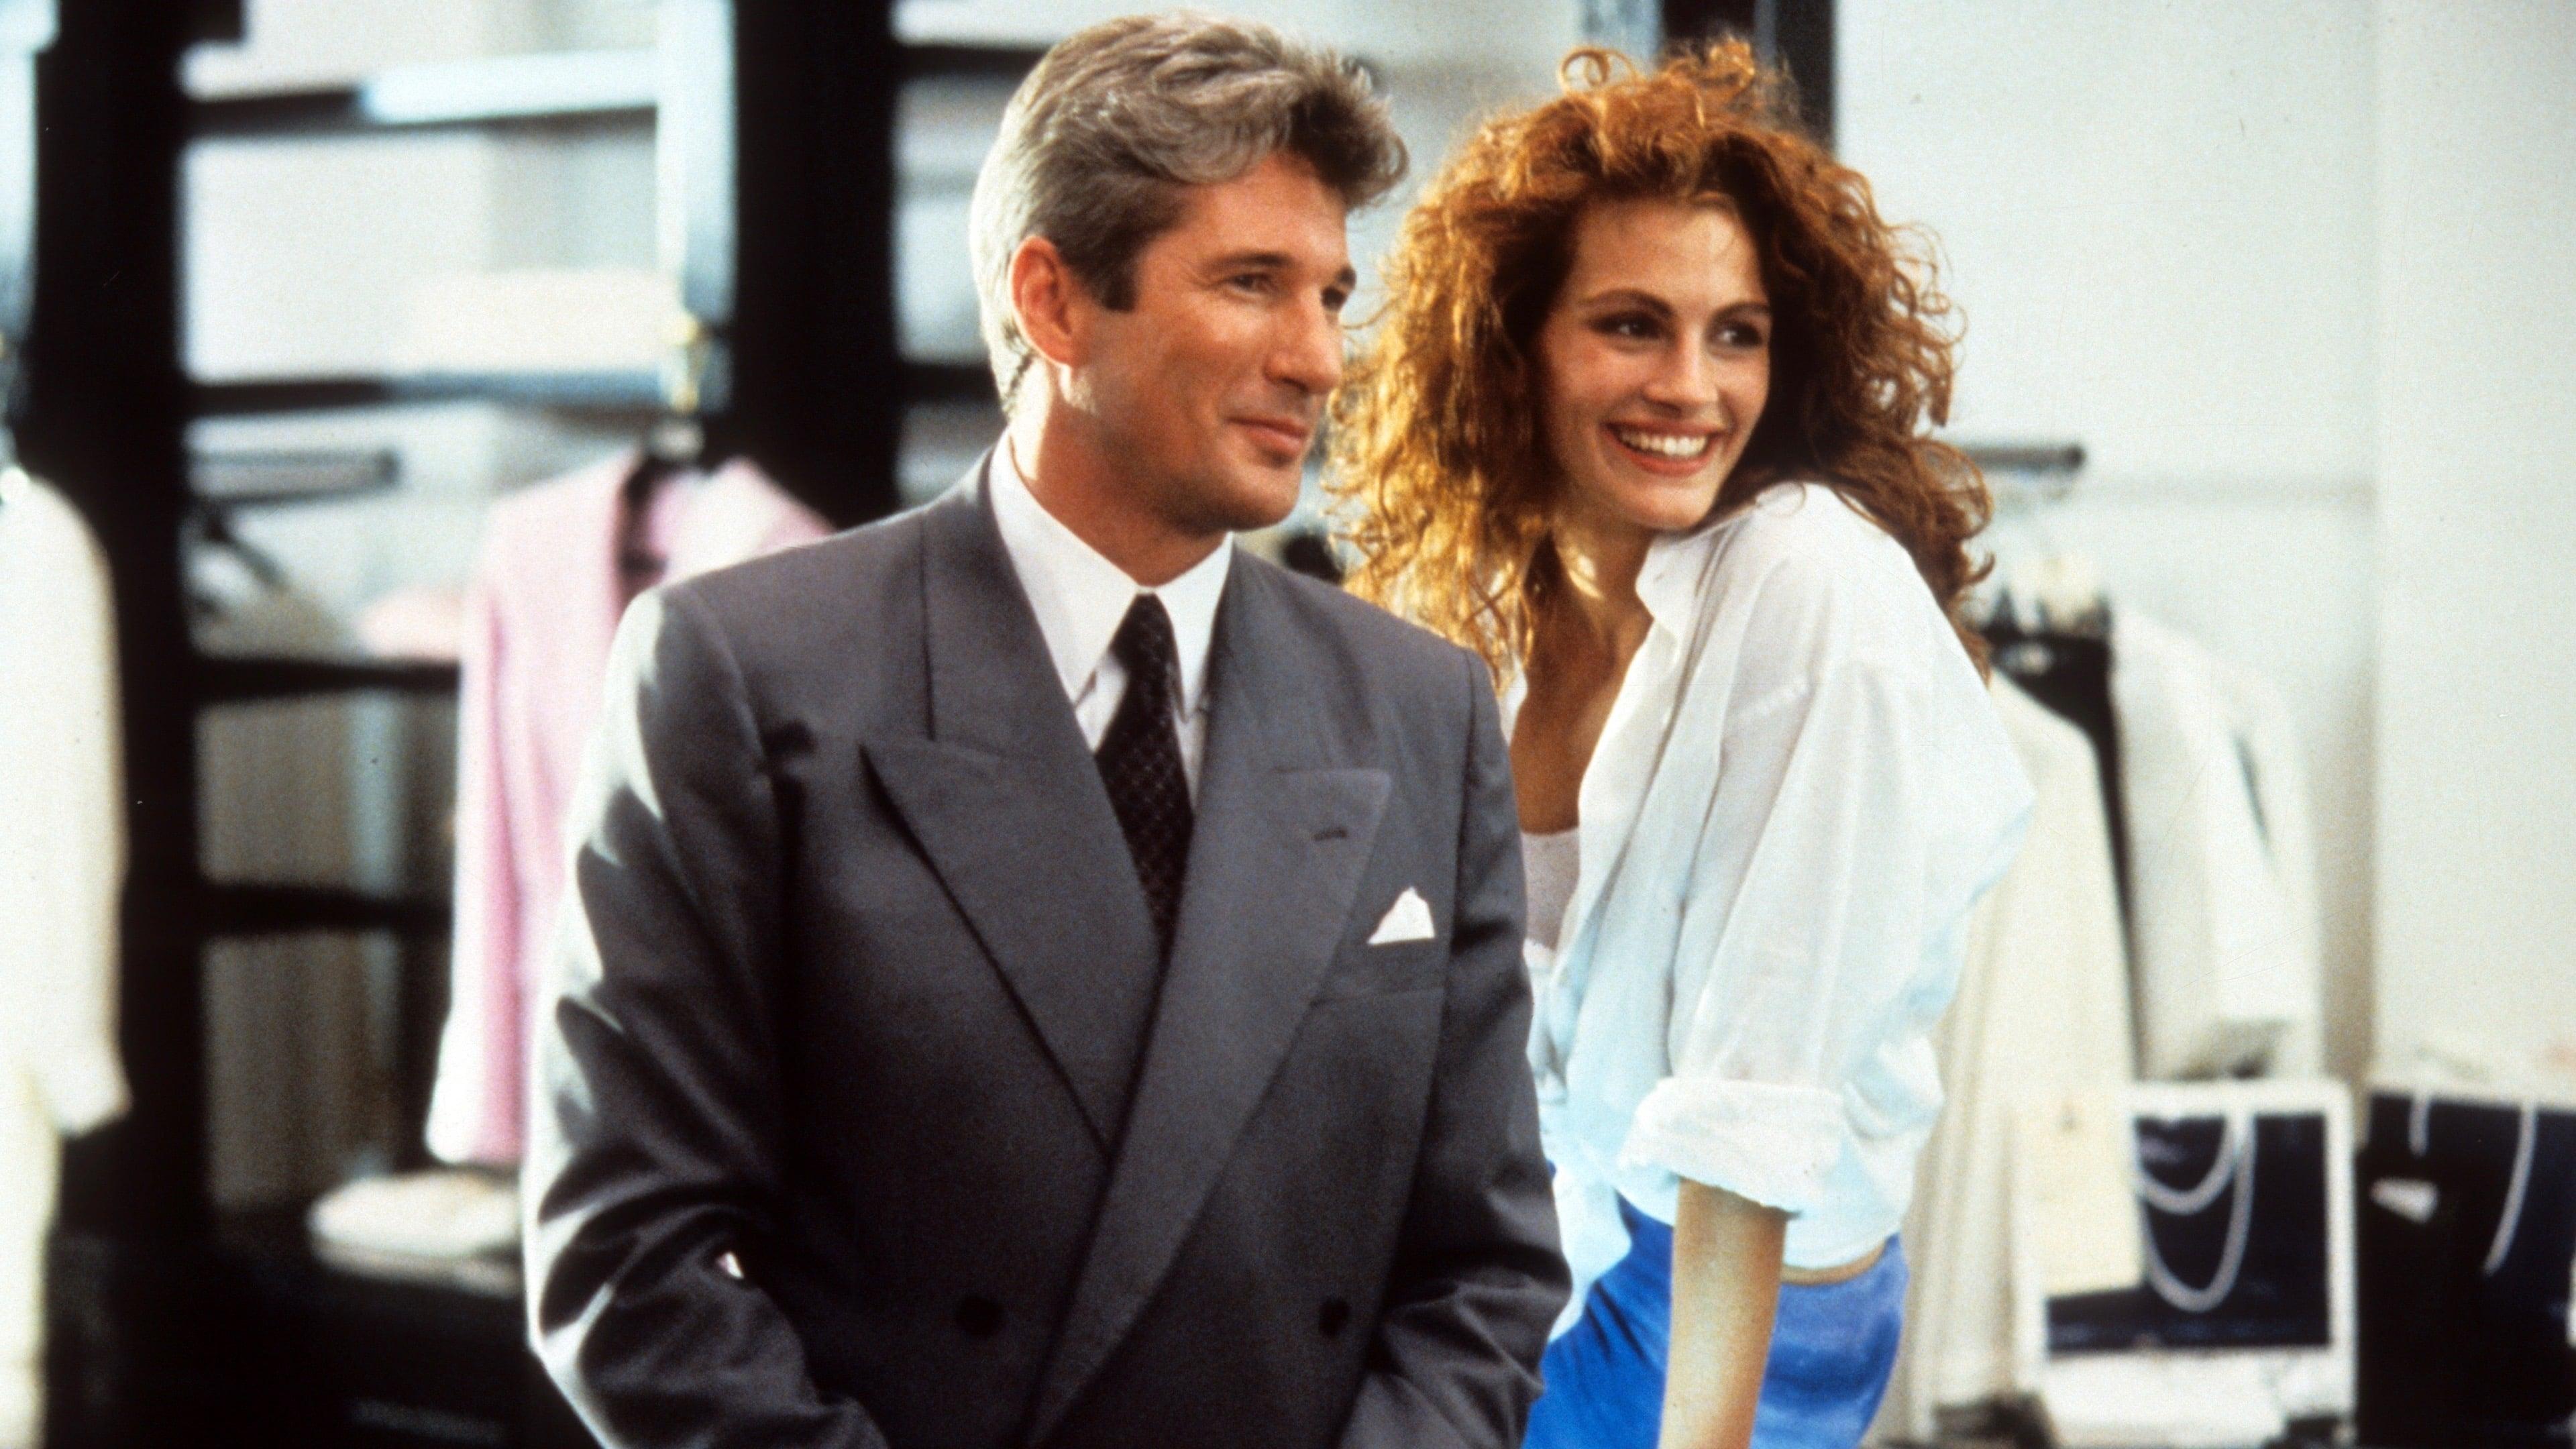 Pretty Woman Film Streaming (1990)